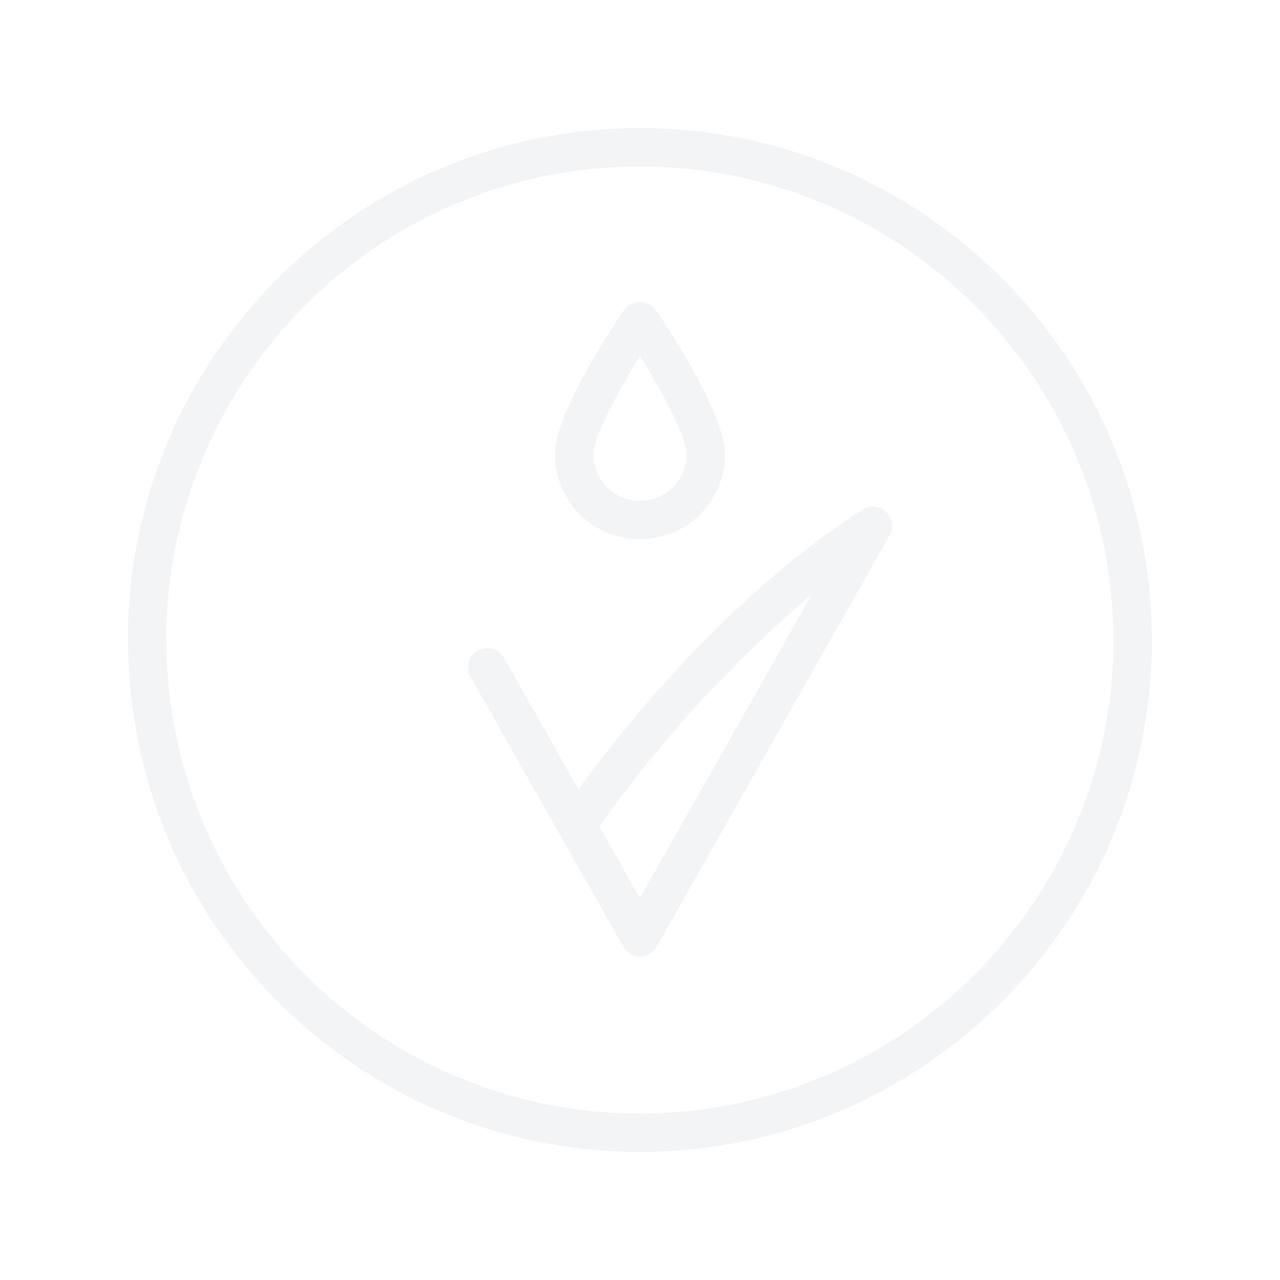 461361c9fe2 Elizabeth Arden Visible Difference Gentle Hydrating Cream 50ml | LOVERTE